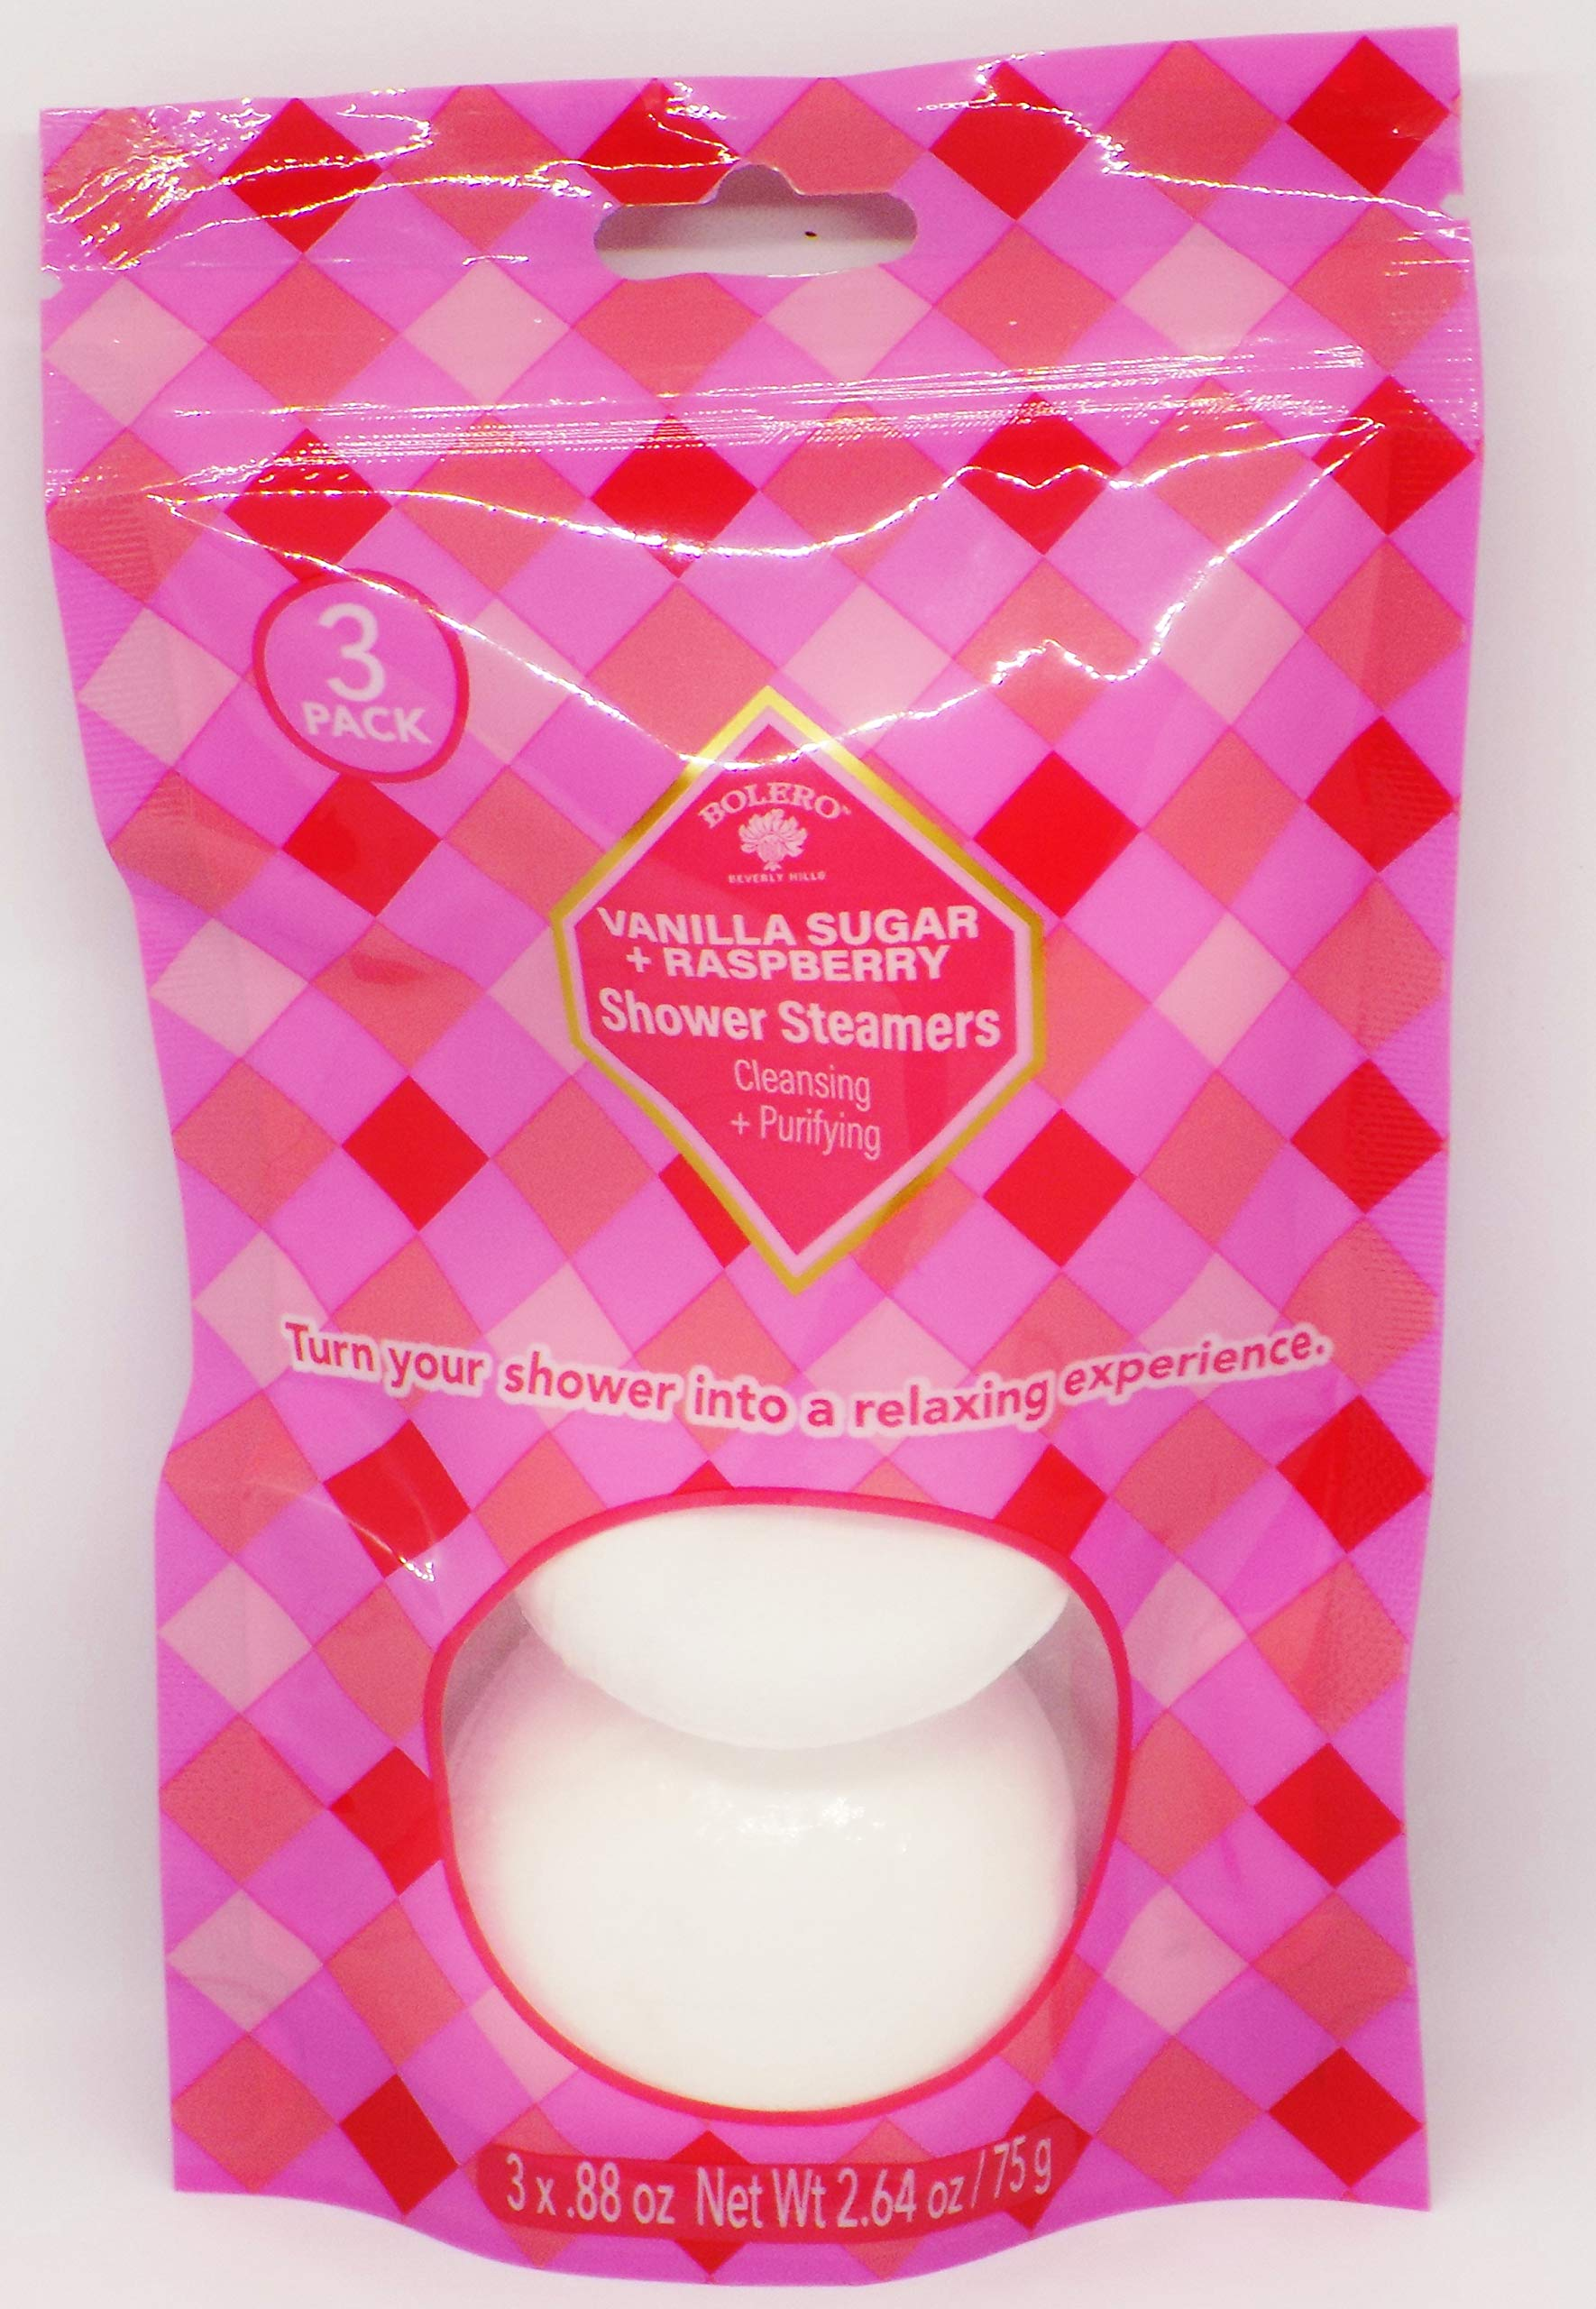 amazon.com - Bolero Vanilla Sugar & Raspberry Shower Steamers